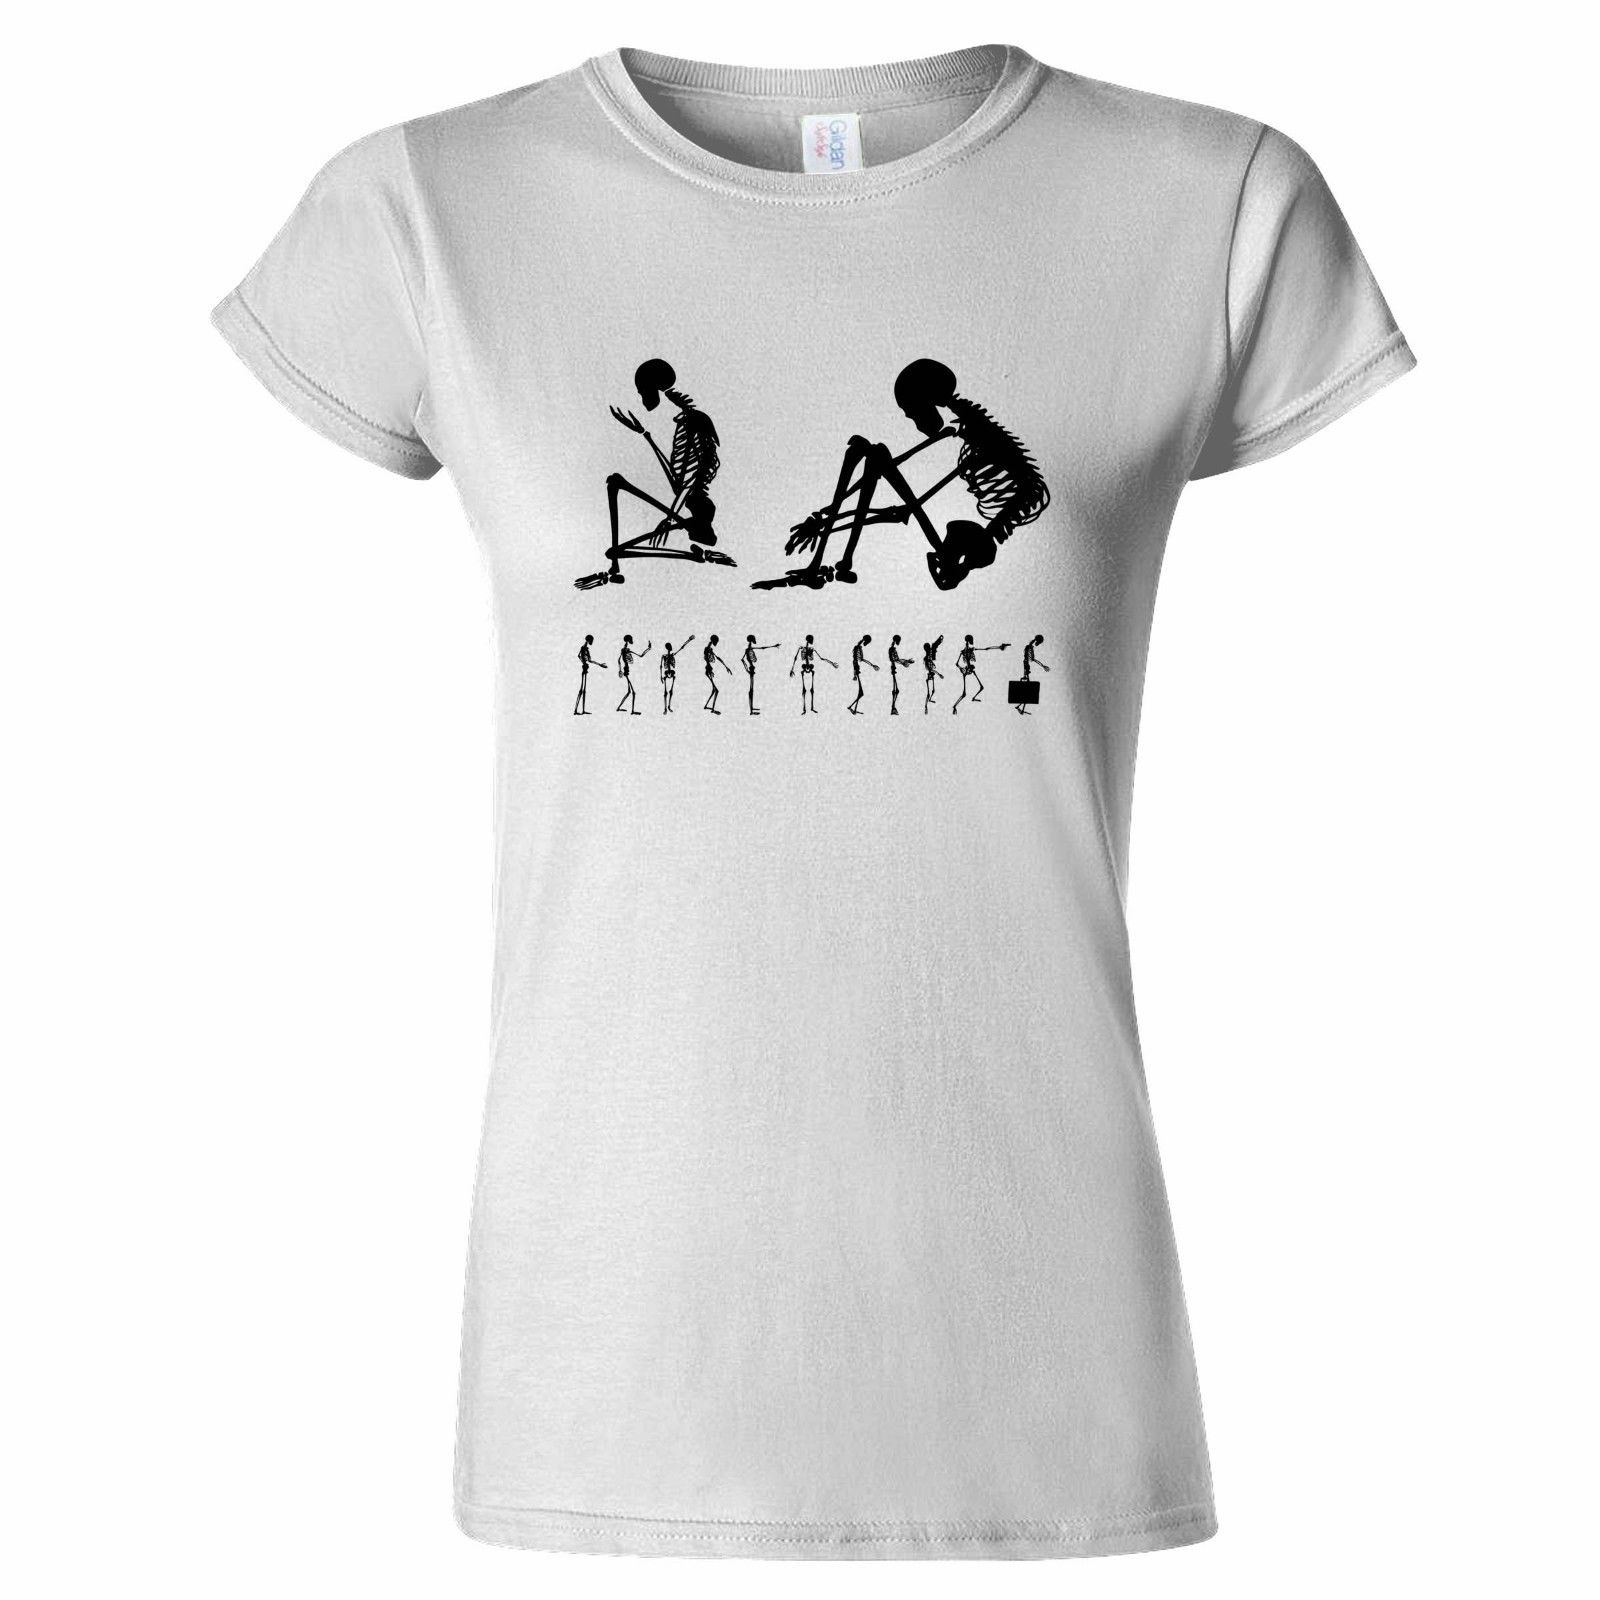 Human design t shirt - Sale 100 Cotton T Shirt Modern Human Skeletons Design Skeleton Science Body Anatomy Funny Short